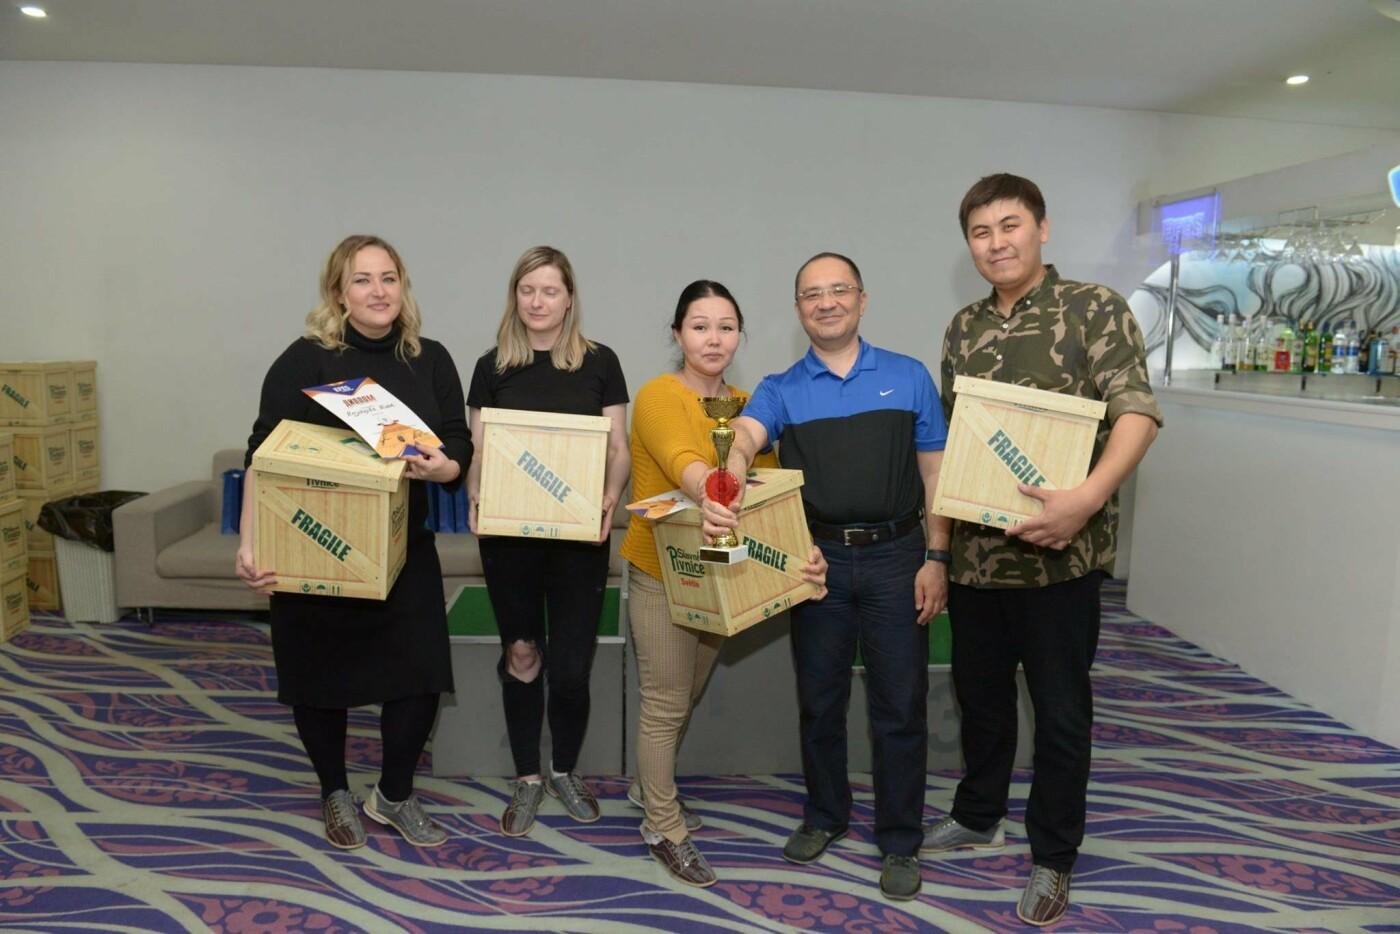 II турнир по боулингу среди журналистов прошел в Алматы (ФОТО), фото-20